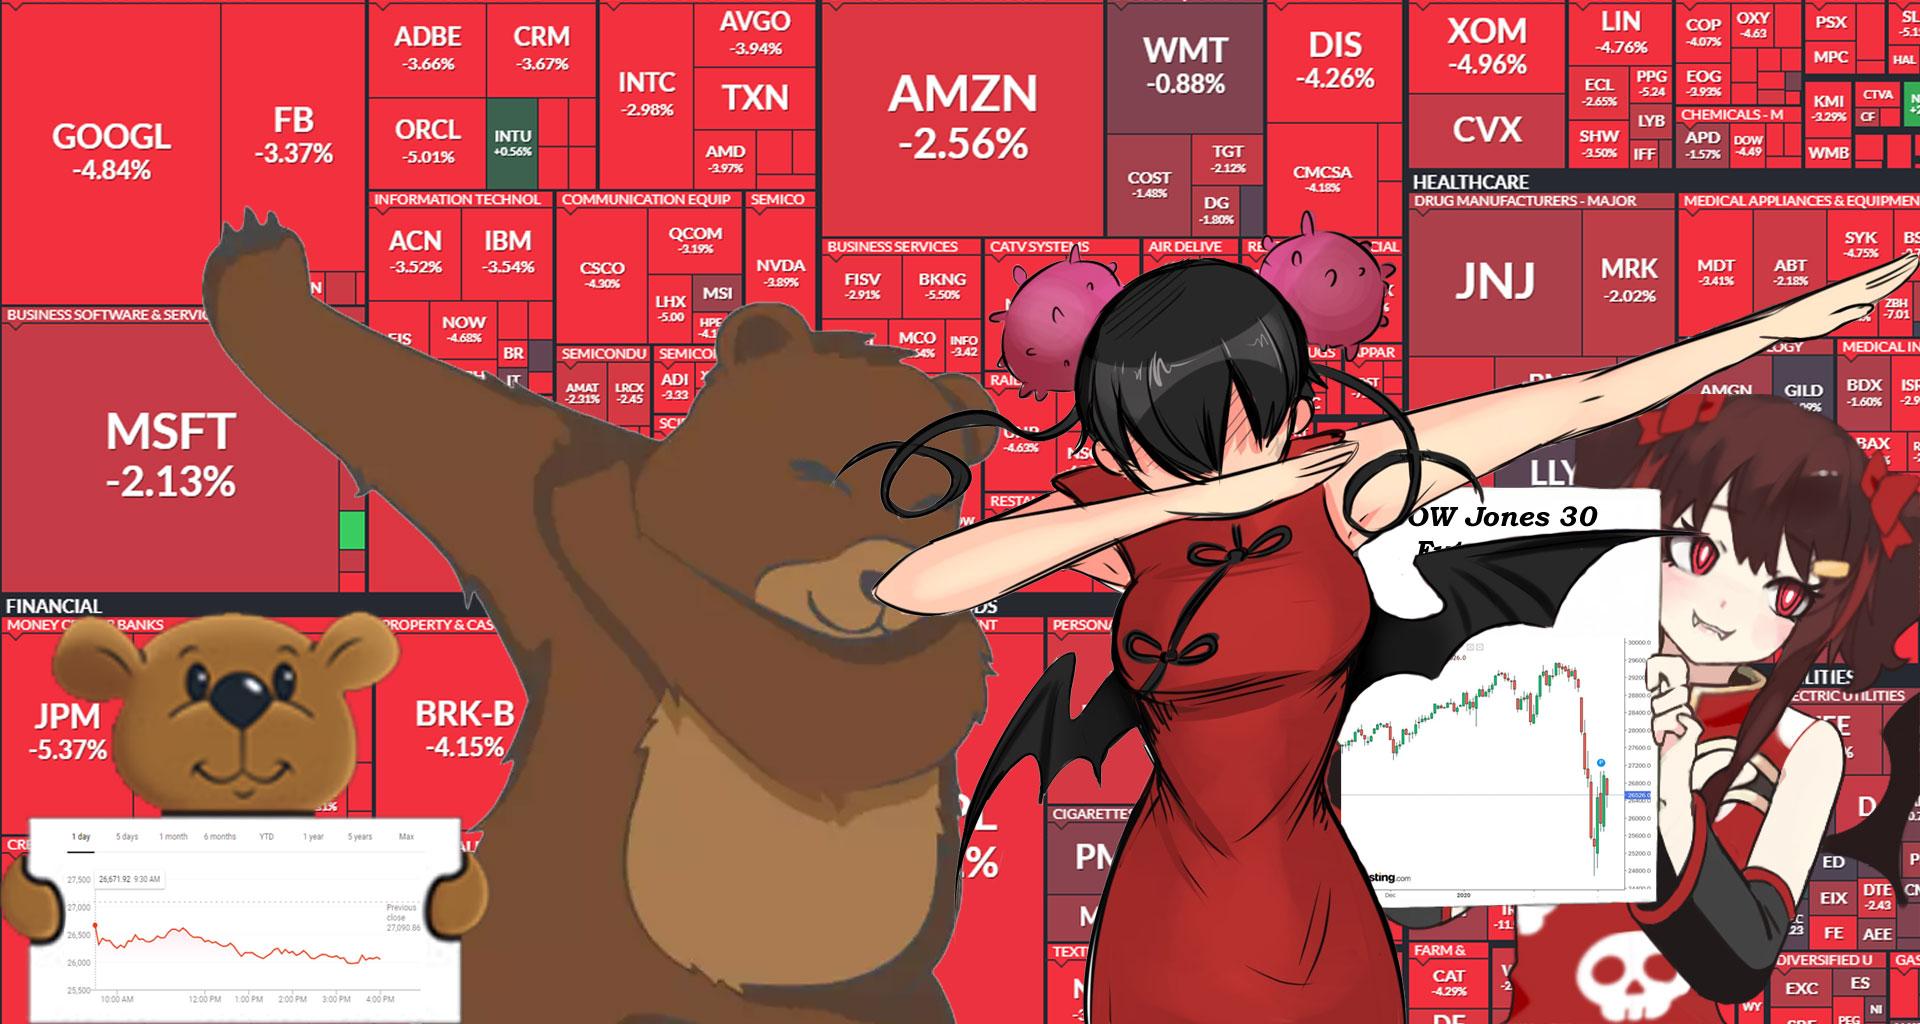 Stock market & corona impact explained, simply.